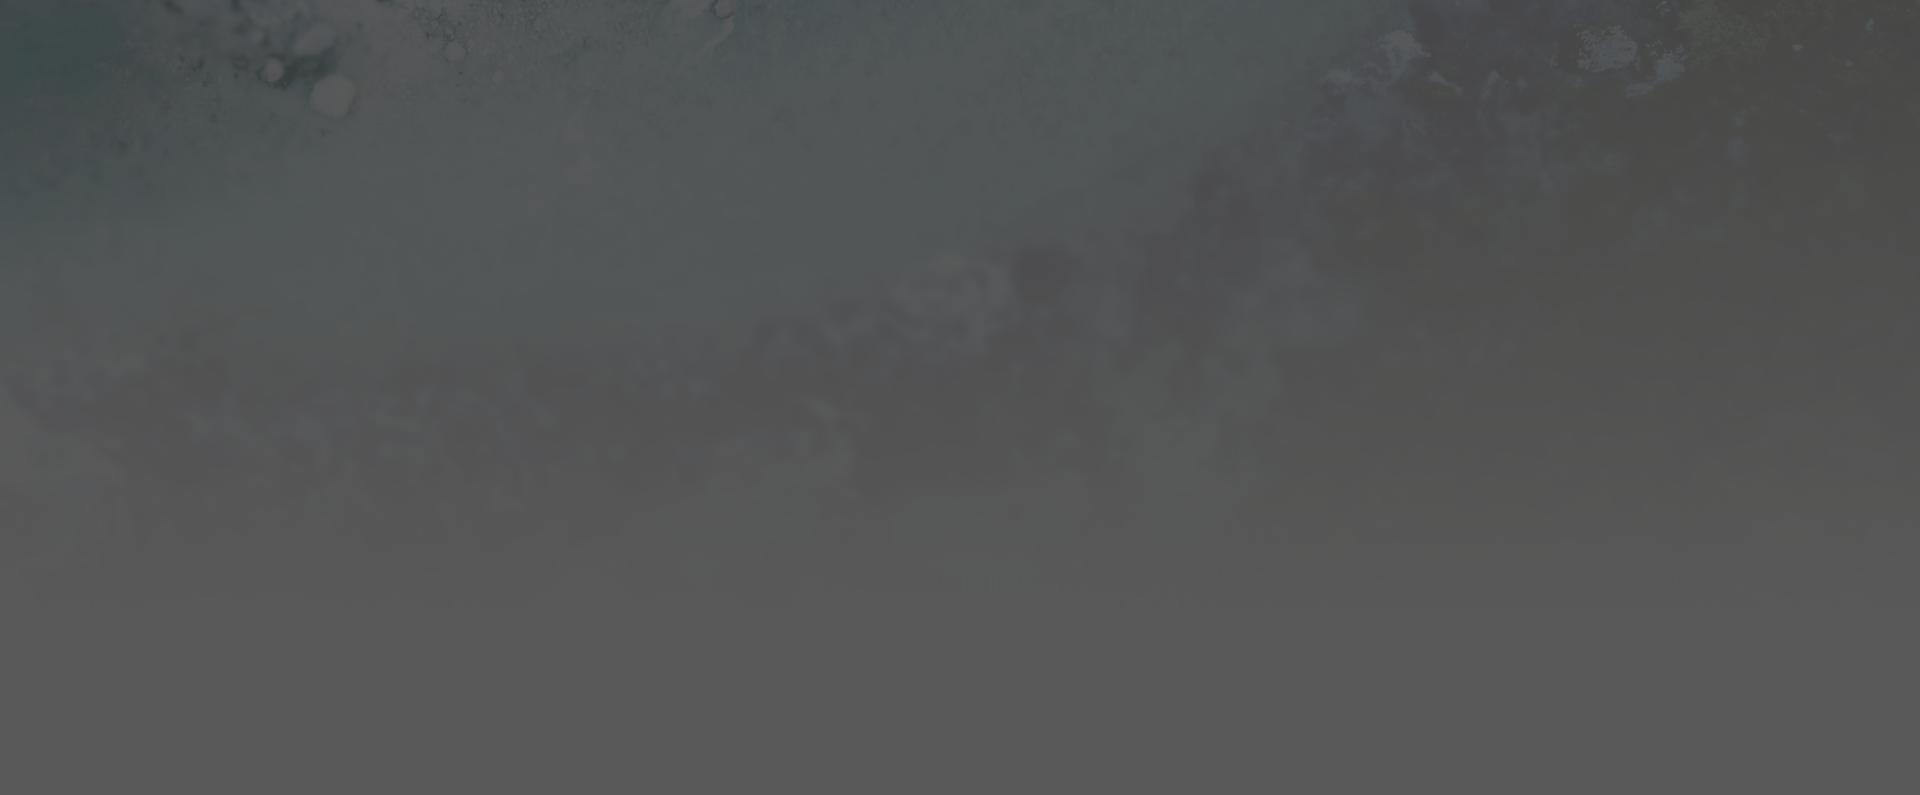 gray-background-medium